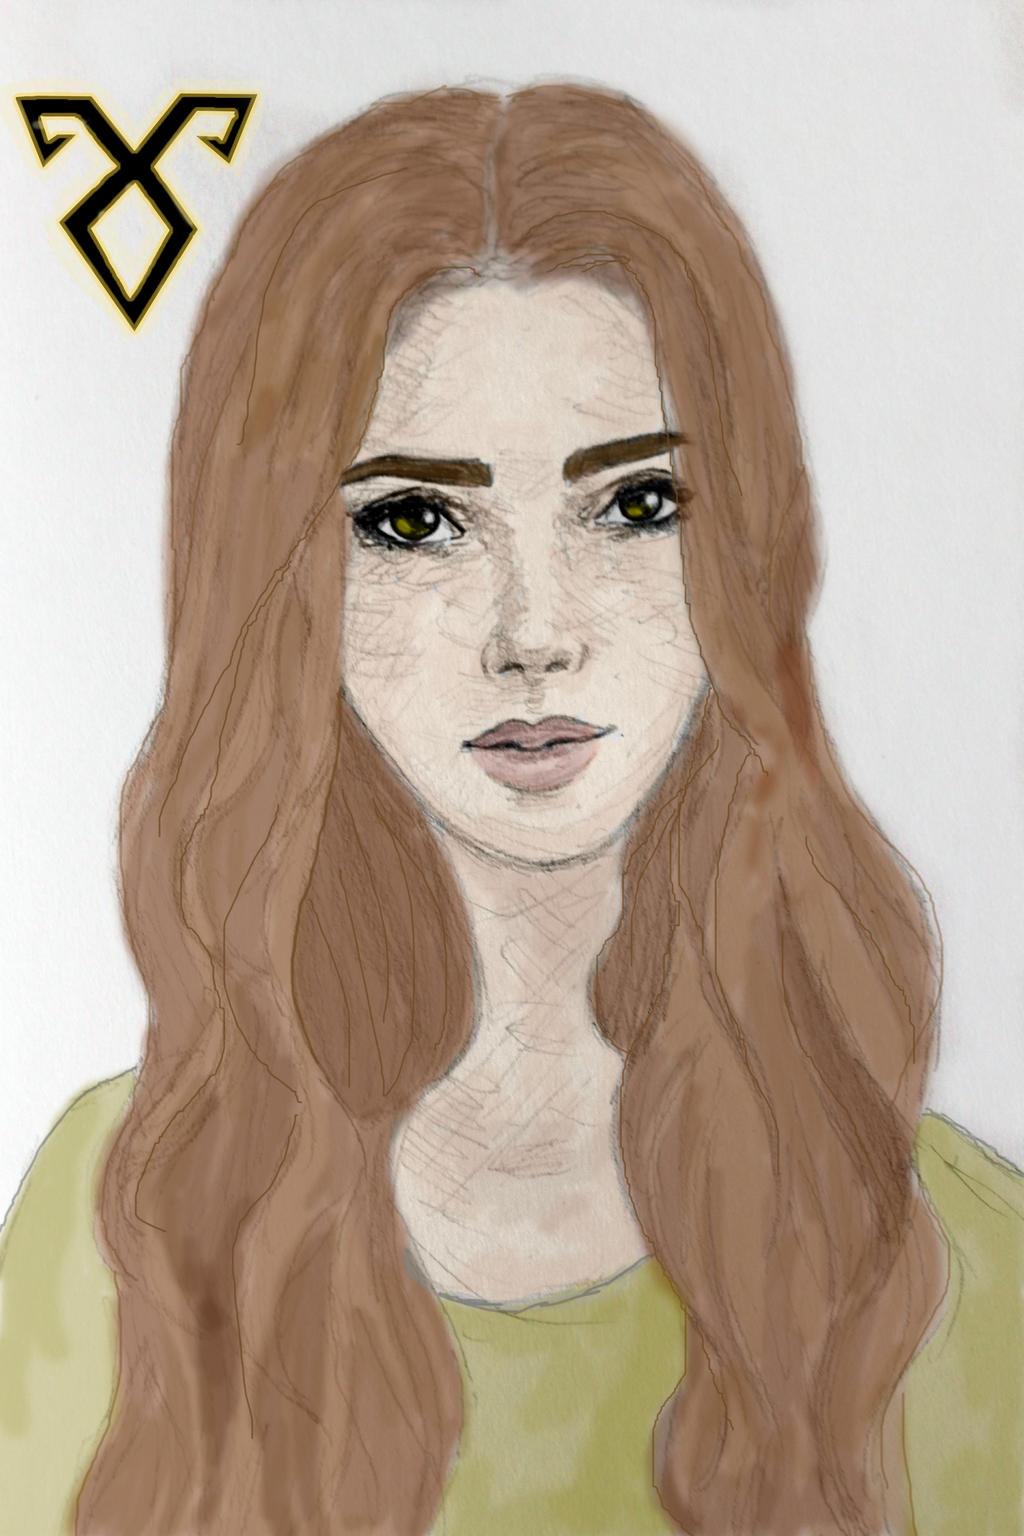 Clary Fray by ZeldaGurl123 on DeviantArt